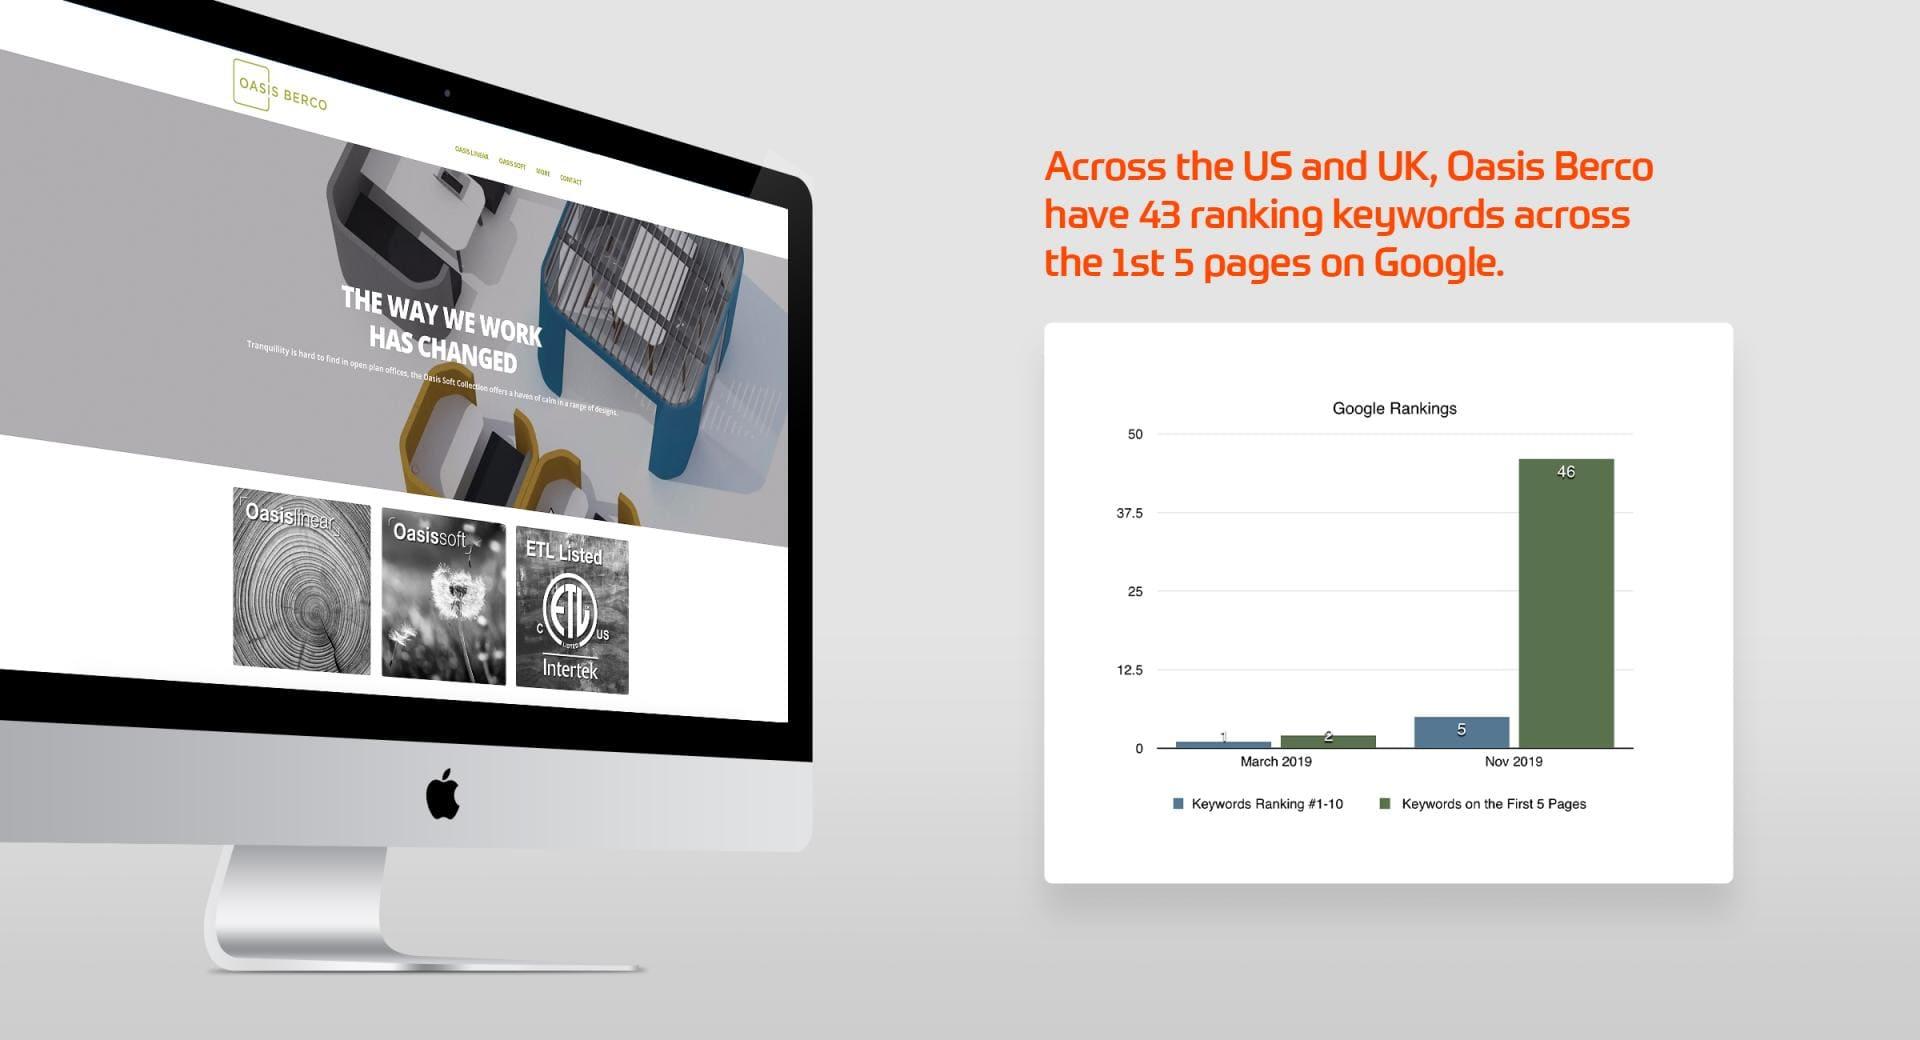 Oasis Berco SEO data for ranking keywords